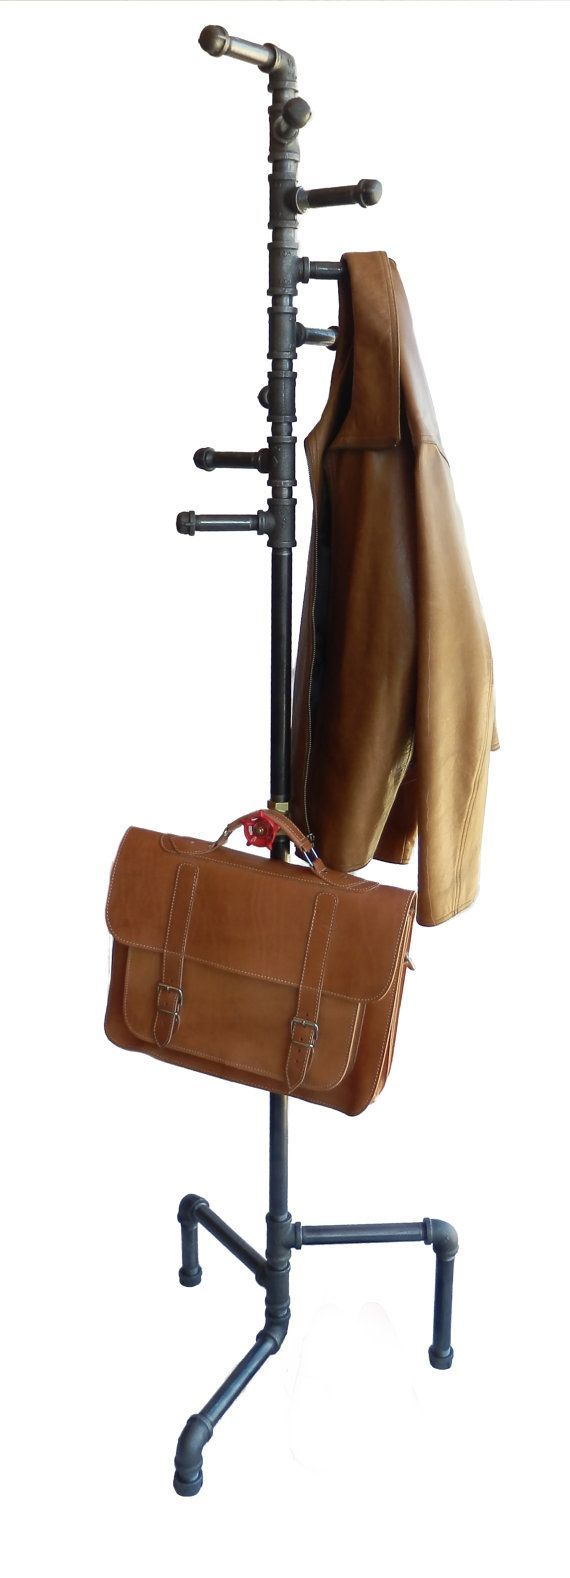 Standing Coat Rack, Industrial Style Black Pipe Spiral